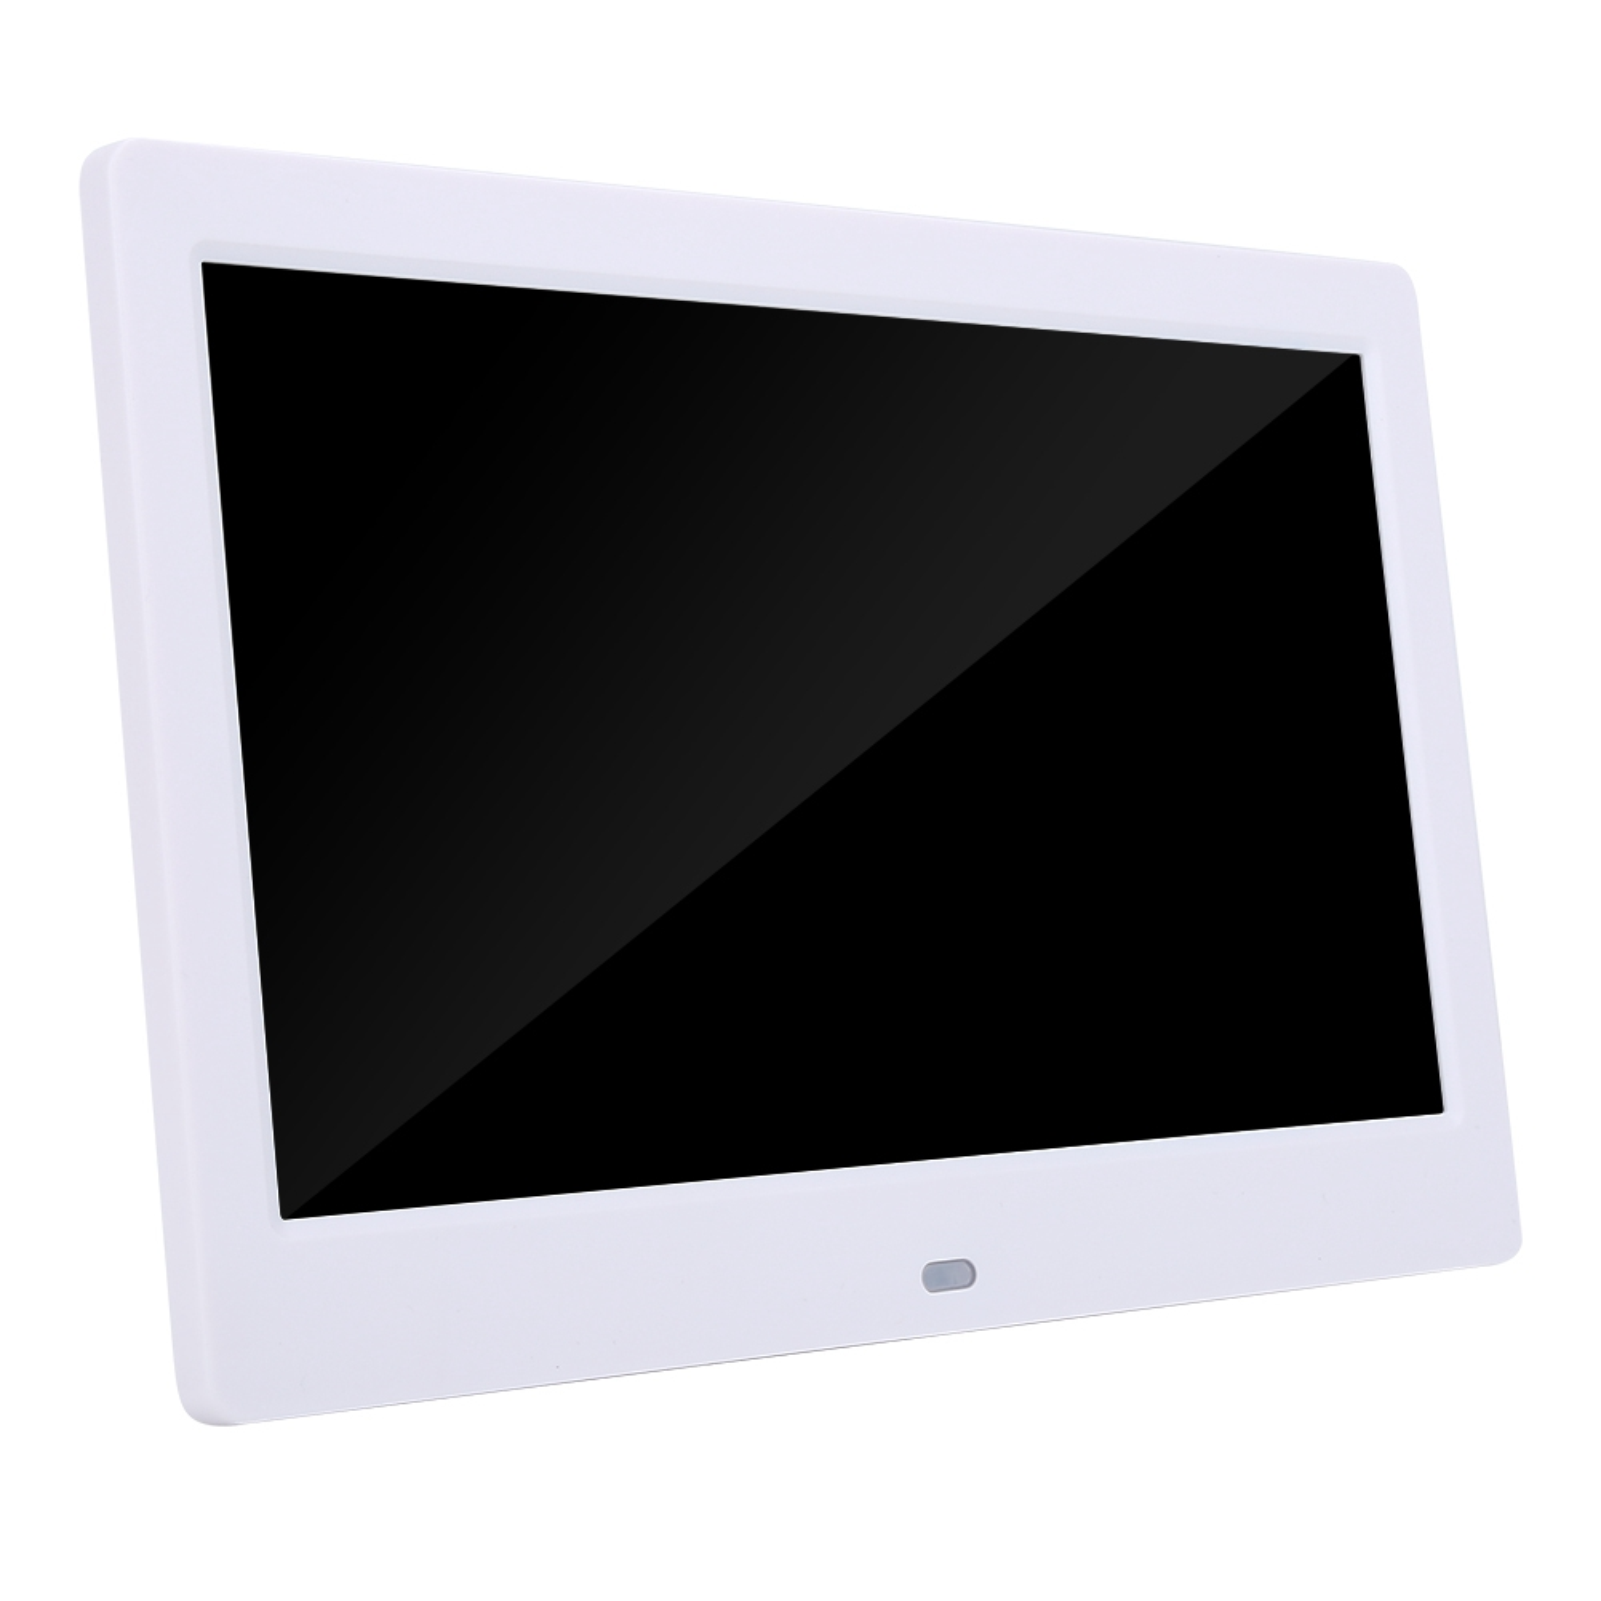 10 hd bildschirm digital bilderrahmen photo frame kalender mp3 film player bs ebay. Black Bedroom Furniture Sets. Home Design Ideas